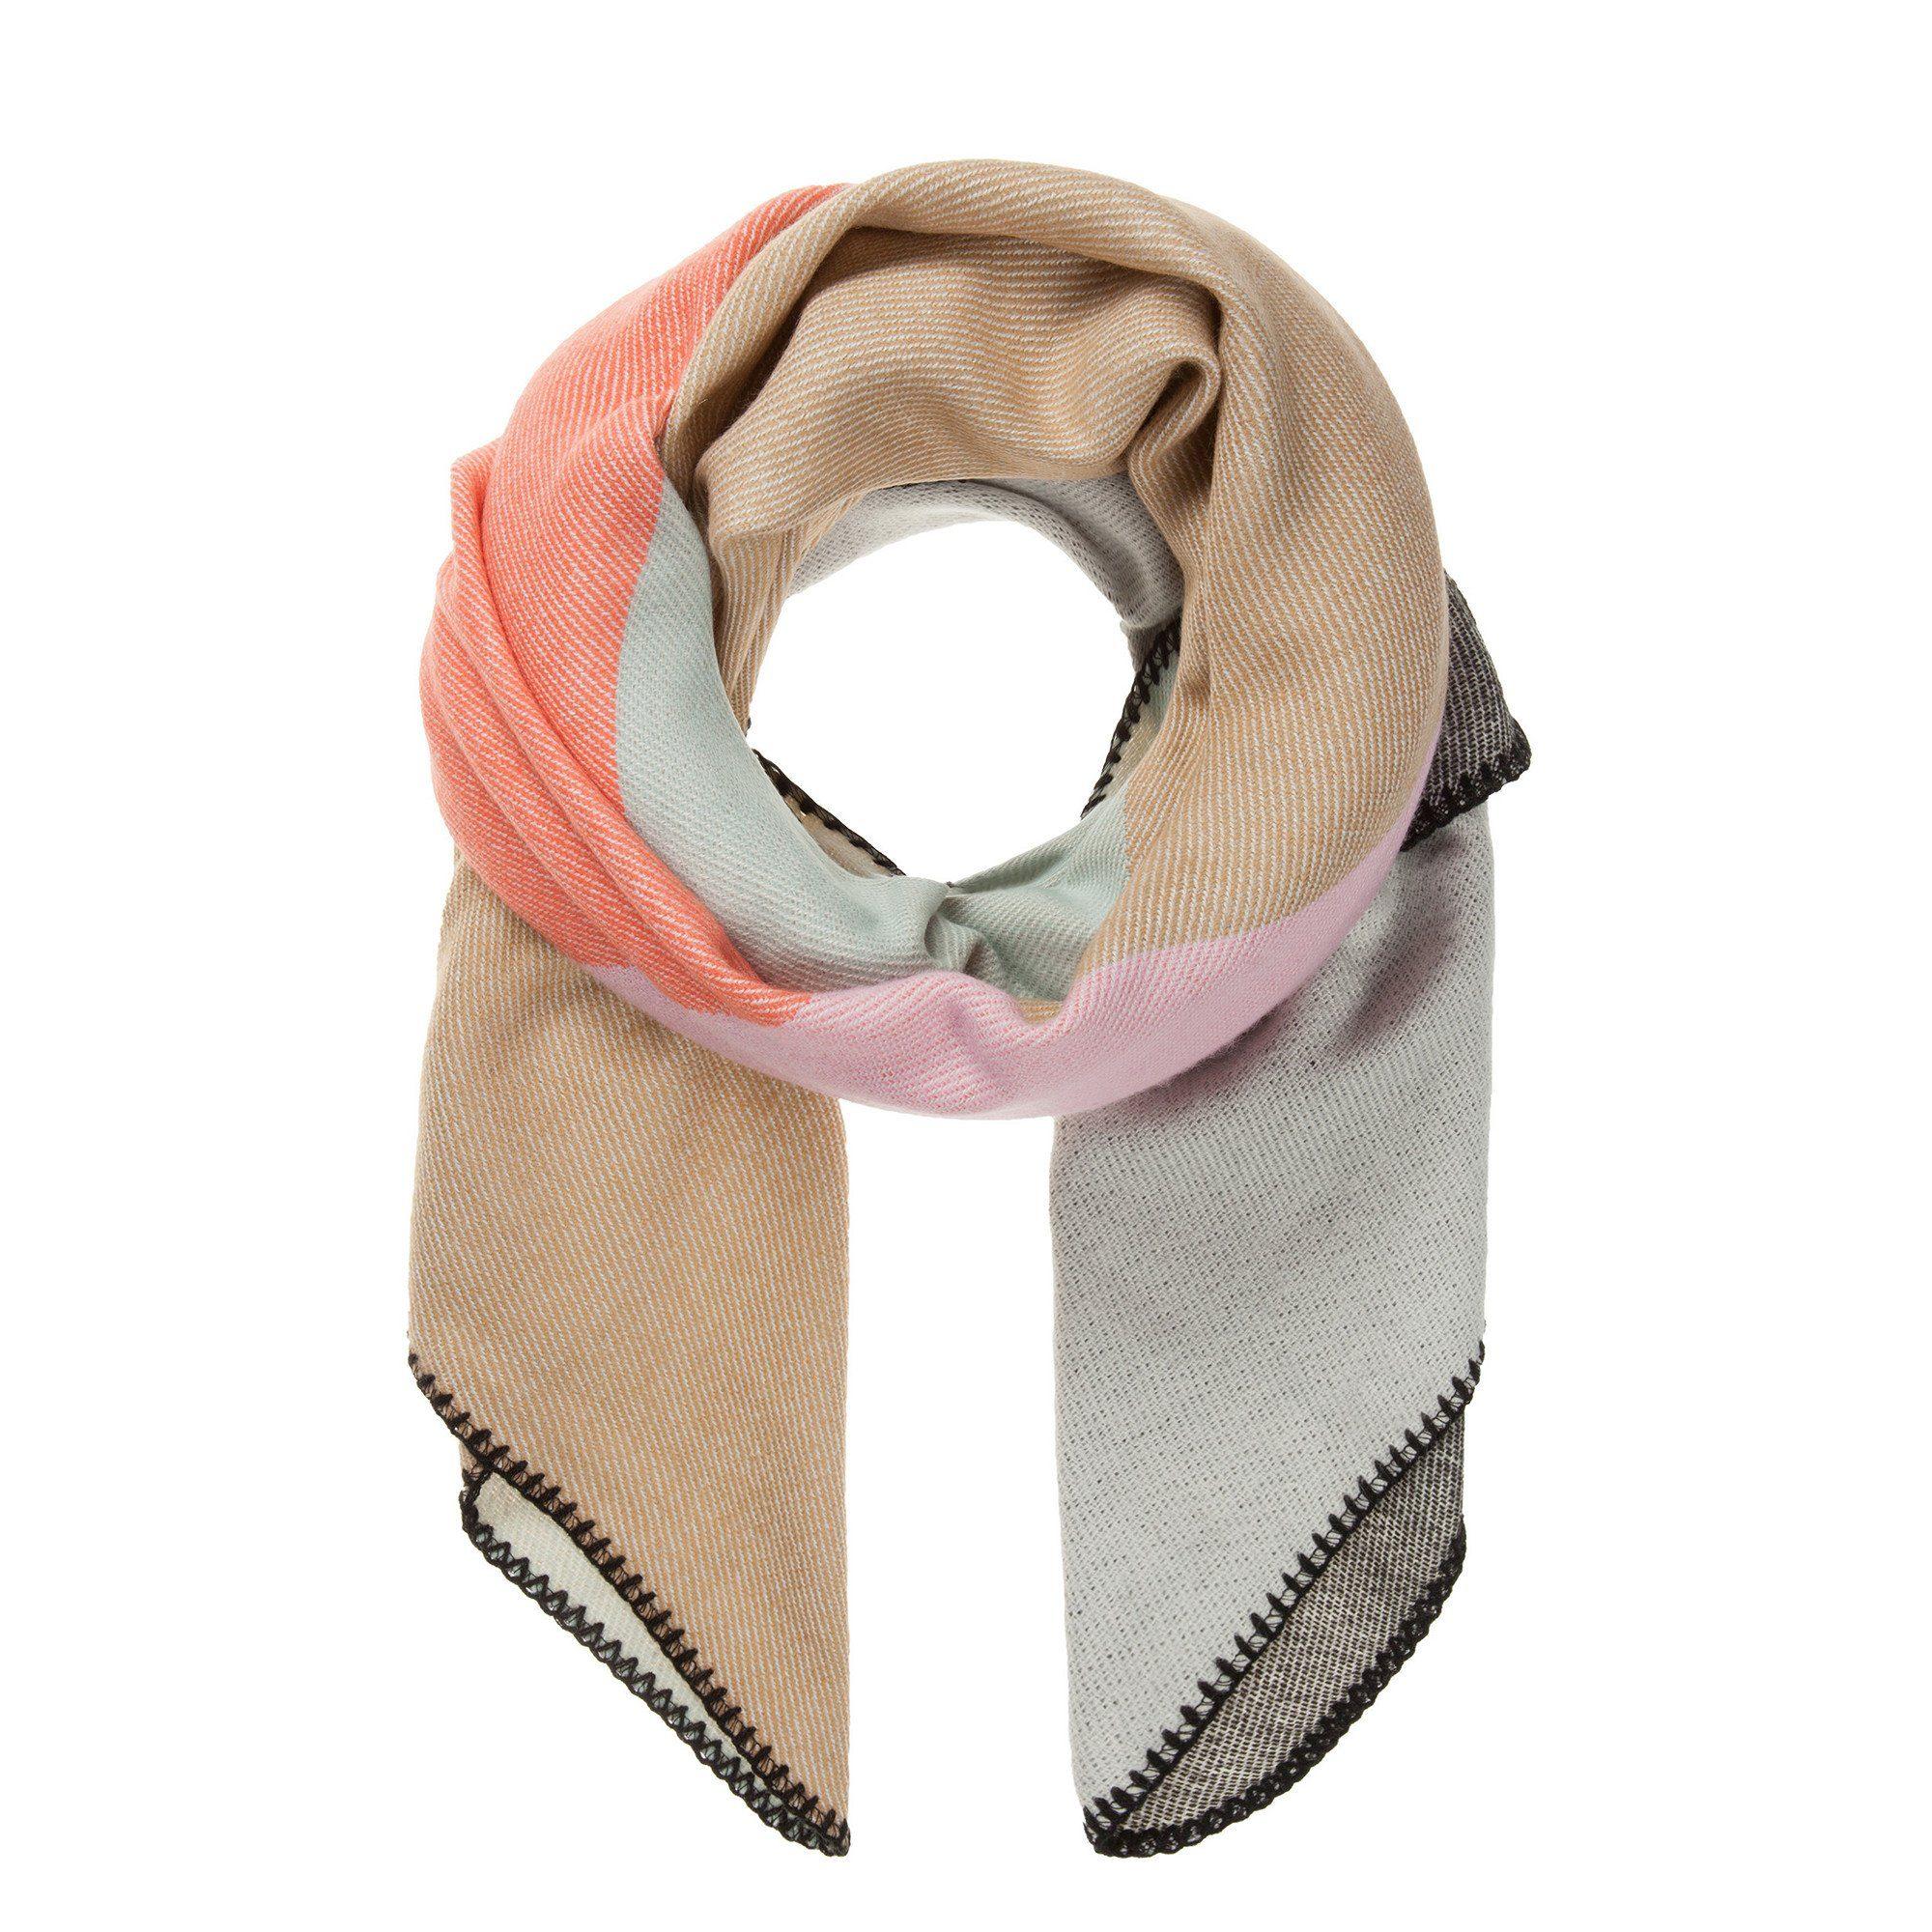 CODELLO Schal im Colour-Blocking-Look